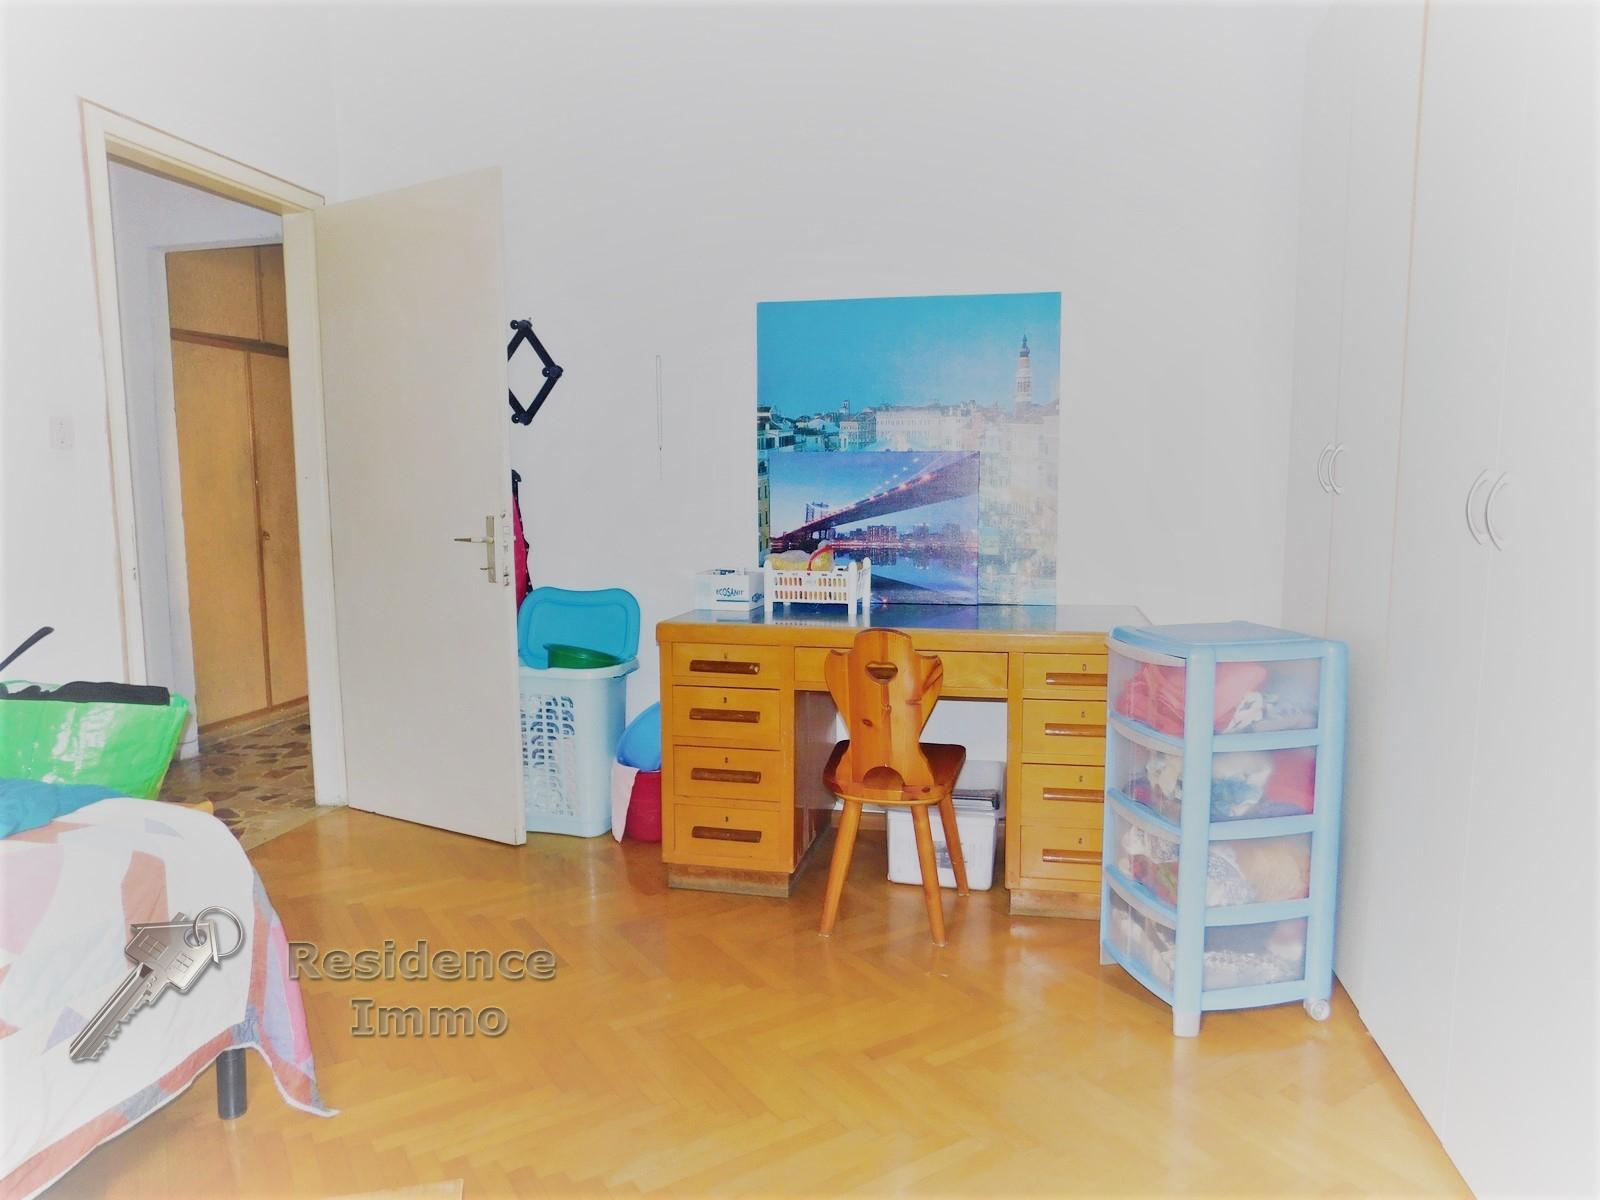 wohnung kaufen in bolzano bozen kodex 2052. Black Bedroom Furniture Sets. Home Design Ideas